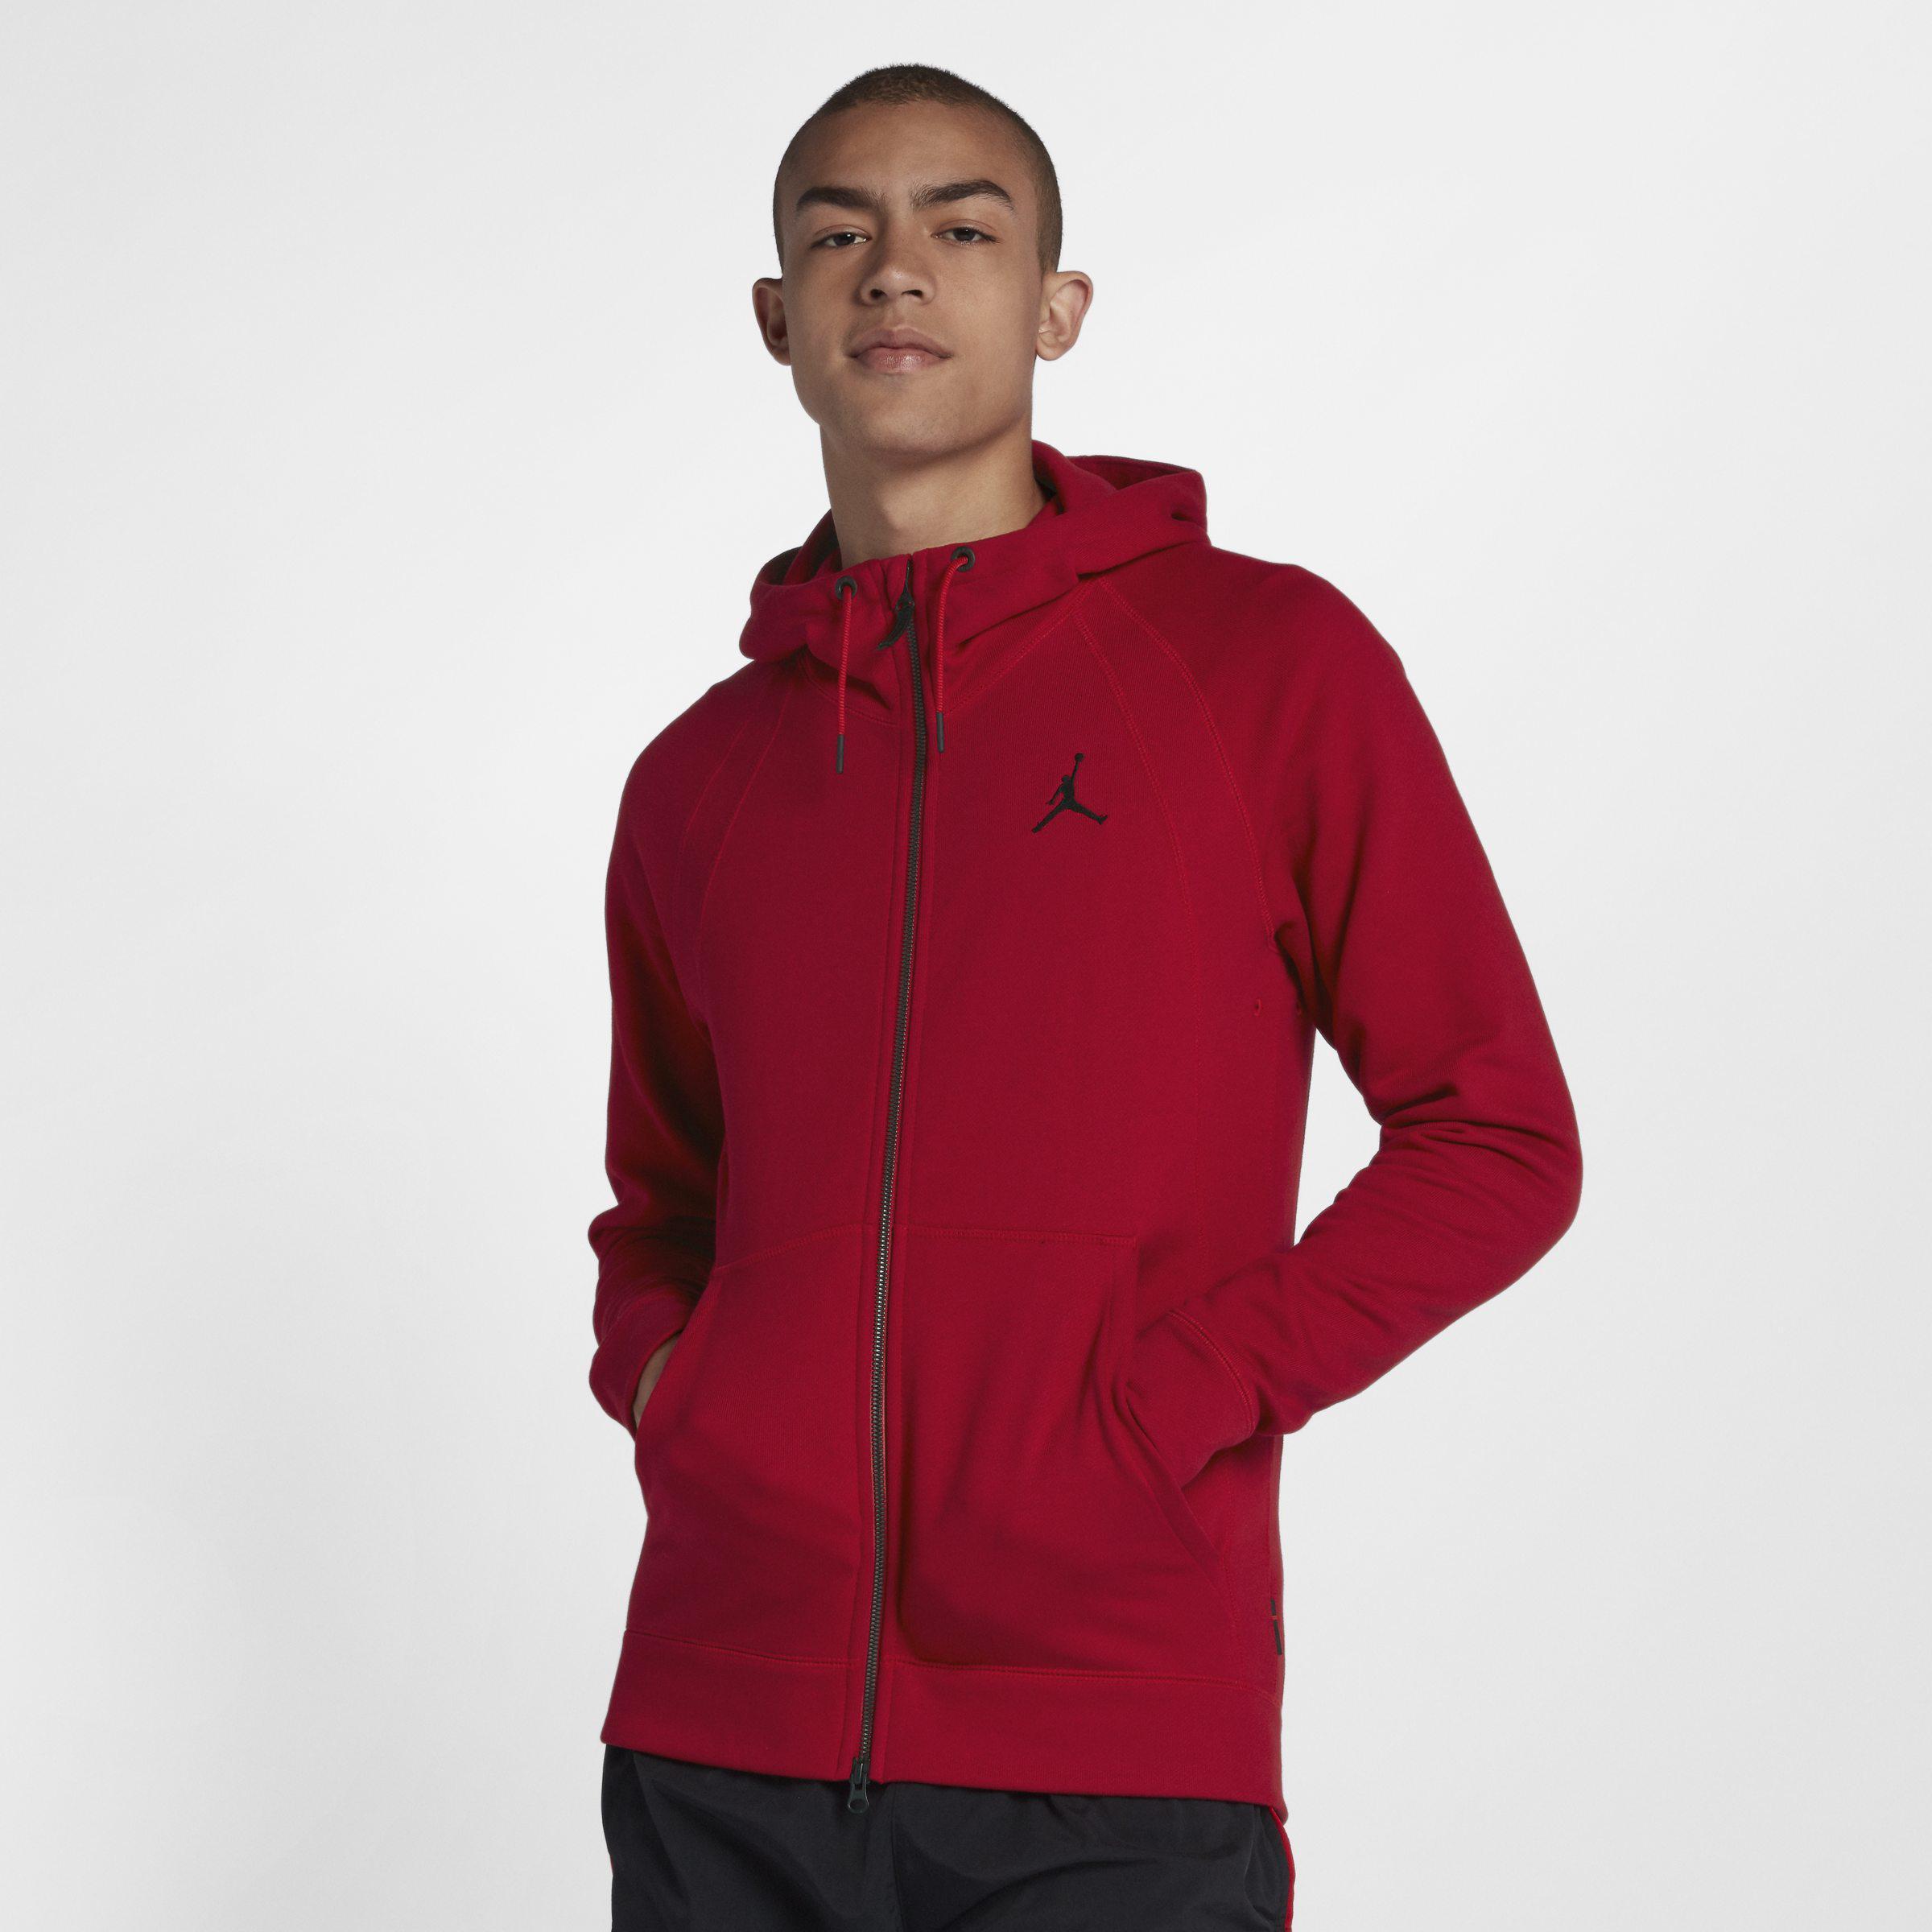 7c586e77bc64e8 Nike Jordan Lifestyle Wings Fleece Full-zip Hoodie in Red for Men - Lyst